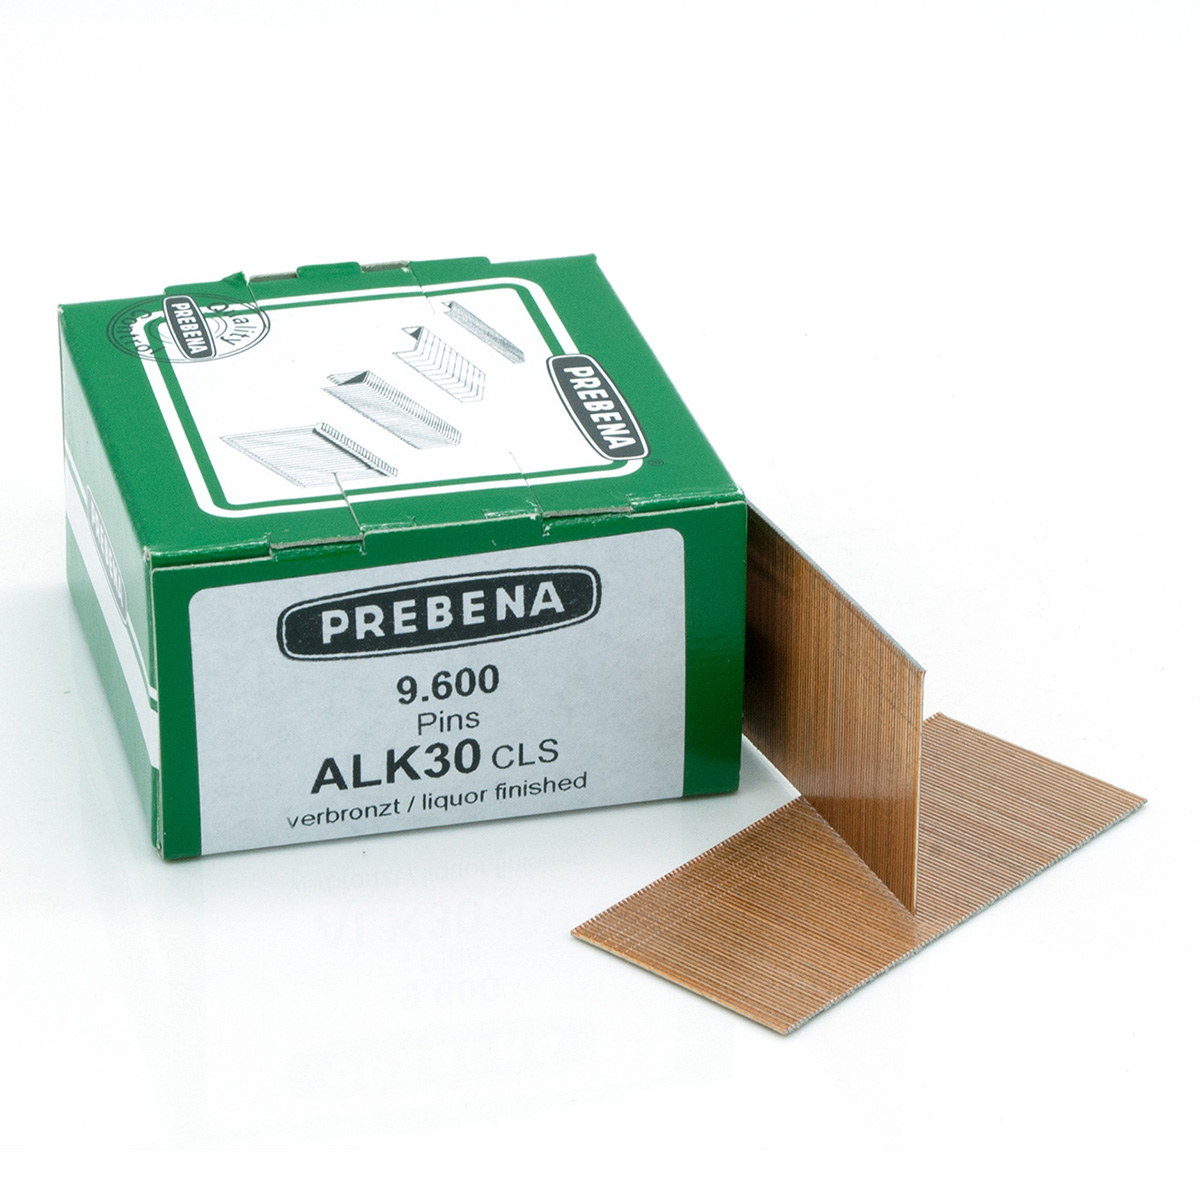 ALK30CLS Pins